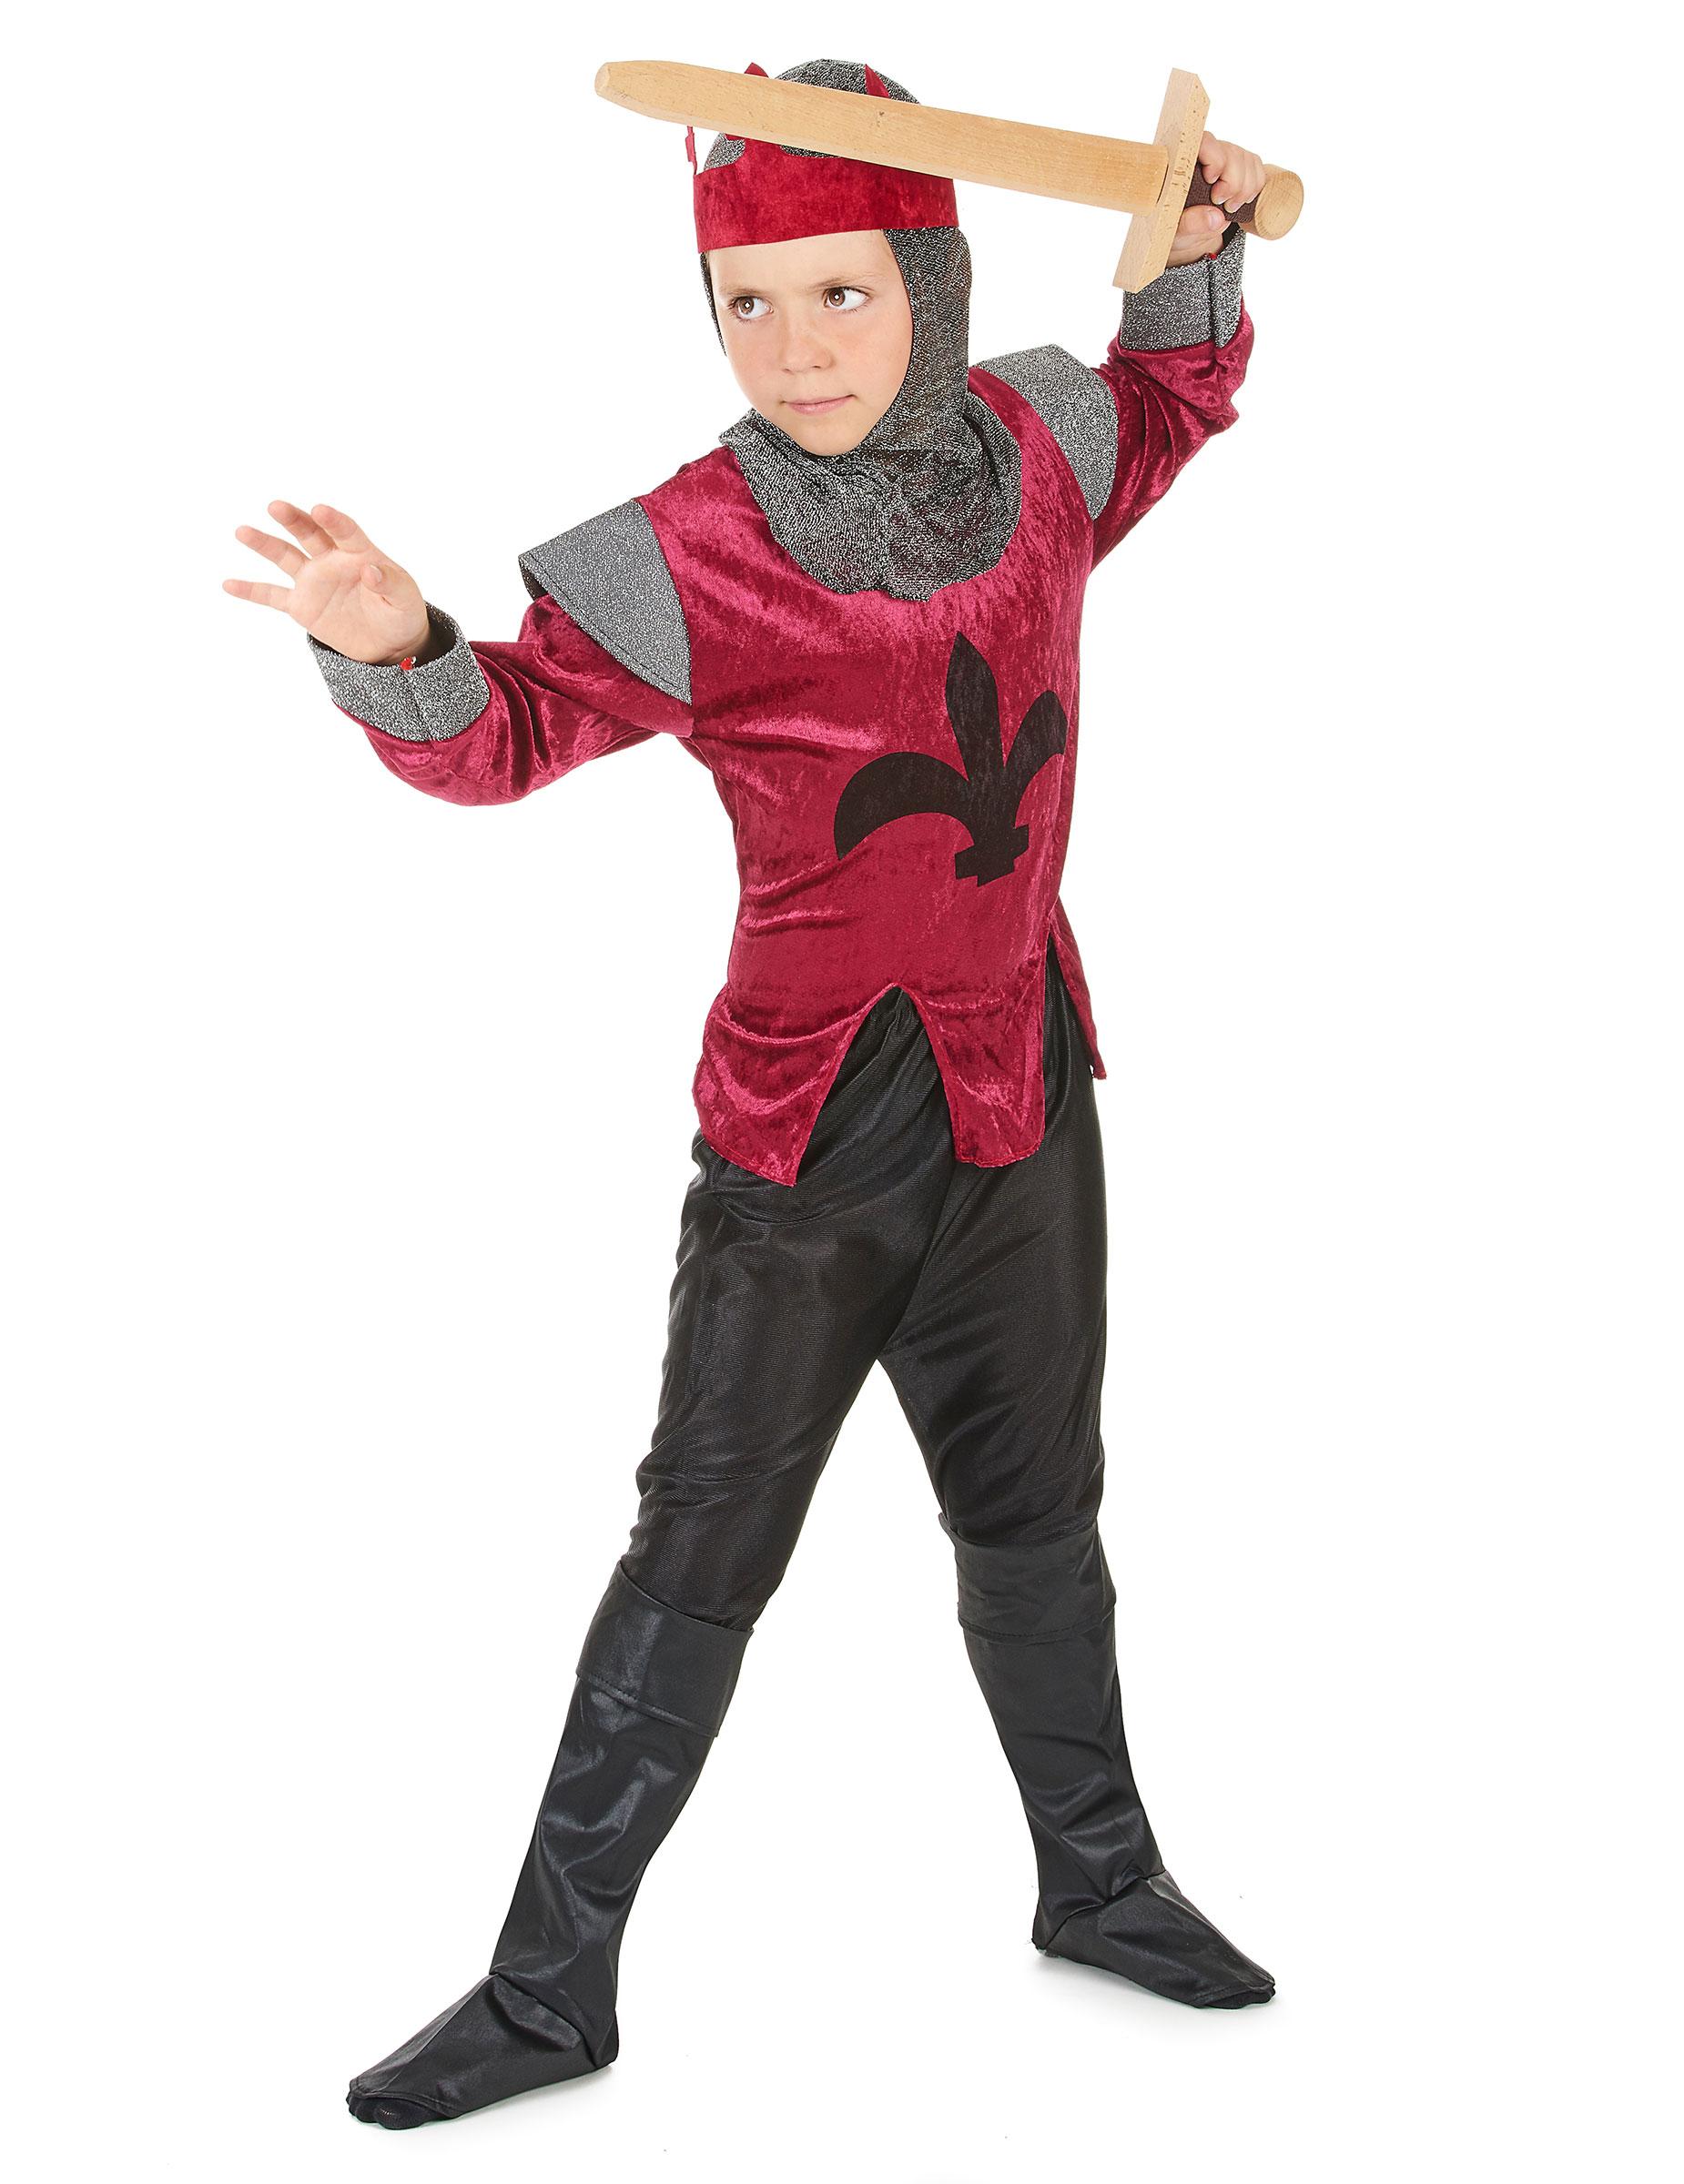 9c31a4a7f Disfraz de rey caballero medieval para niño